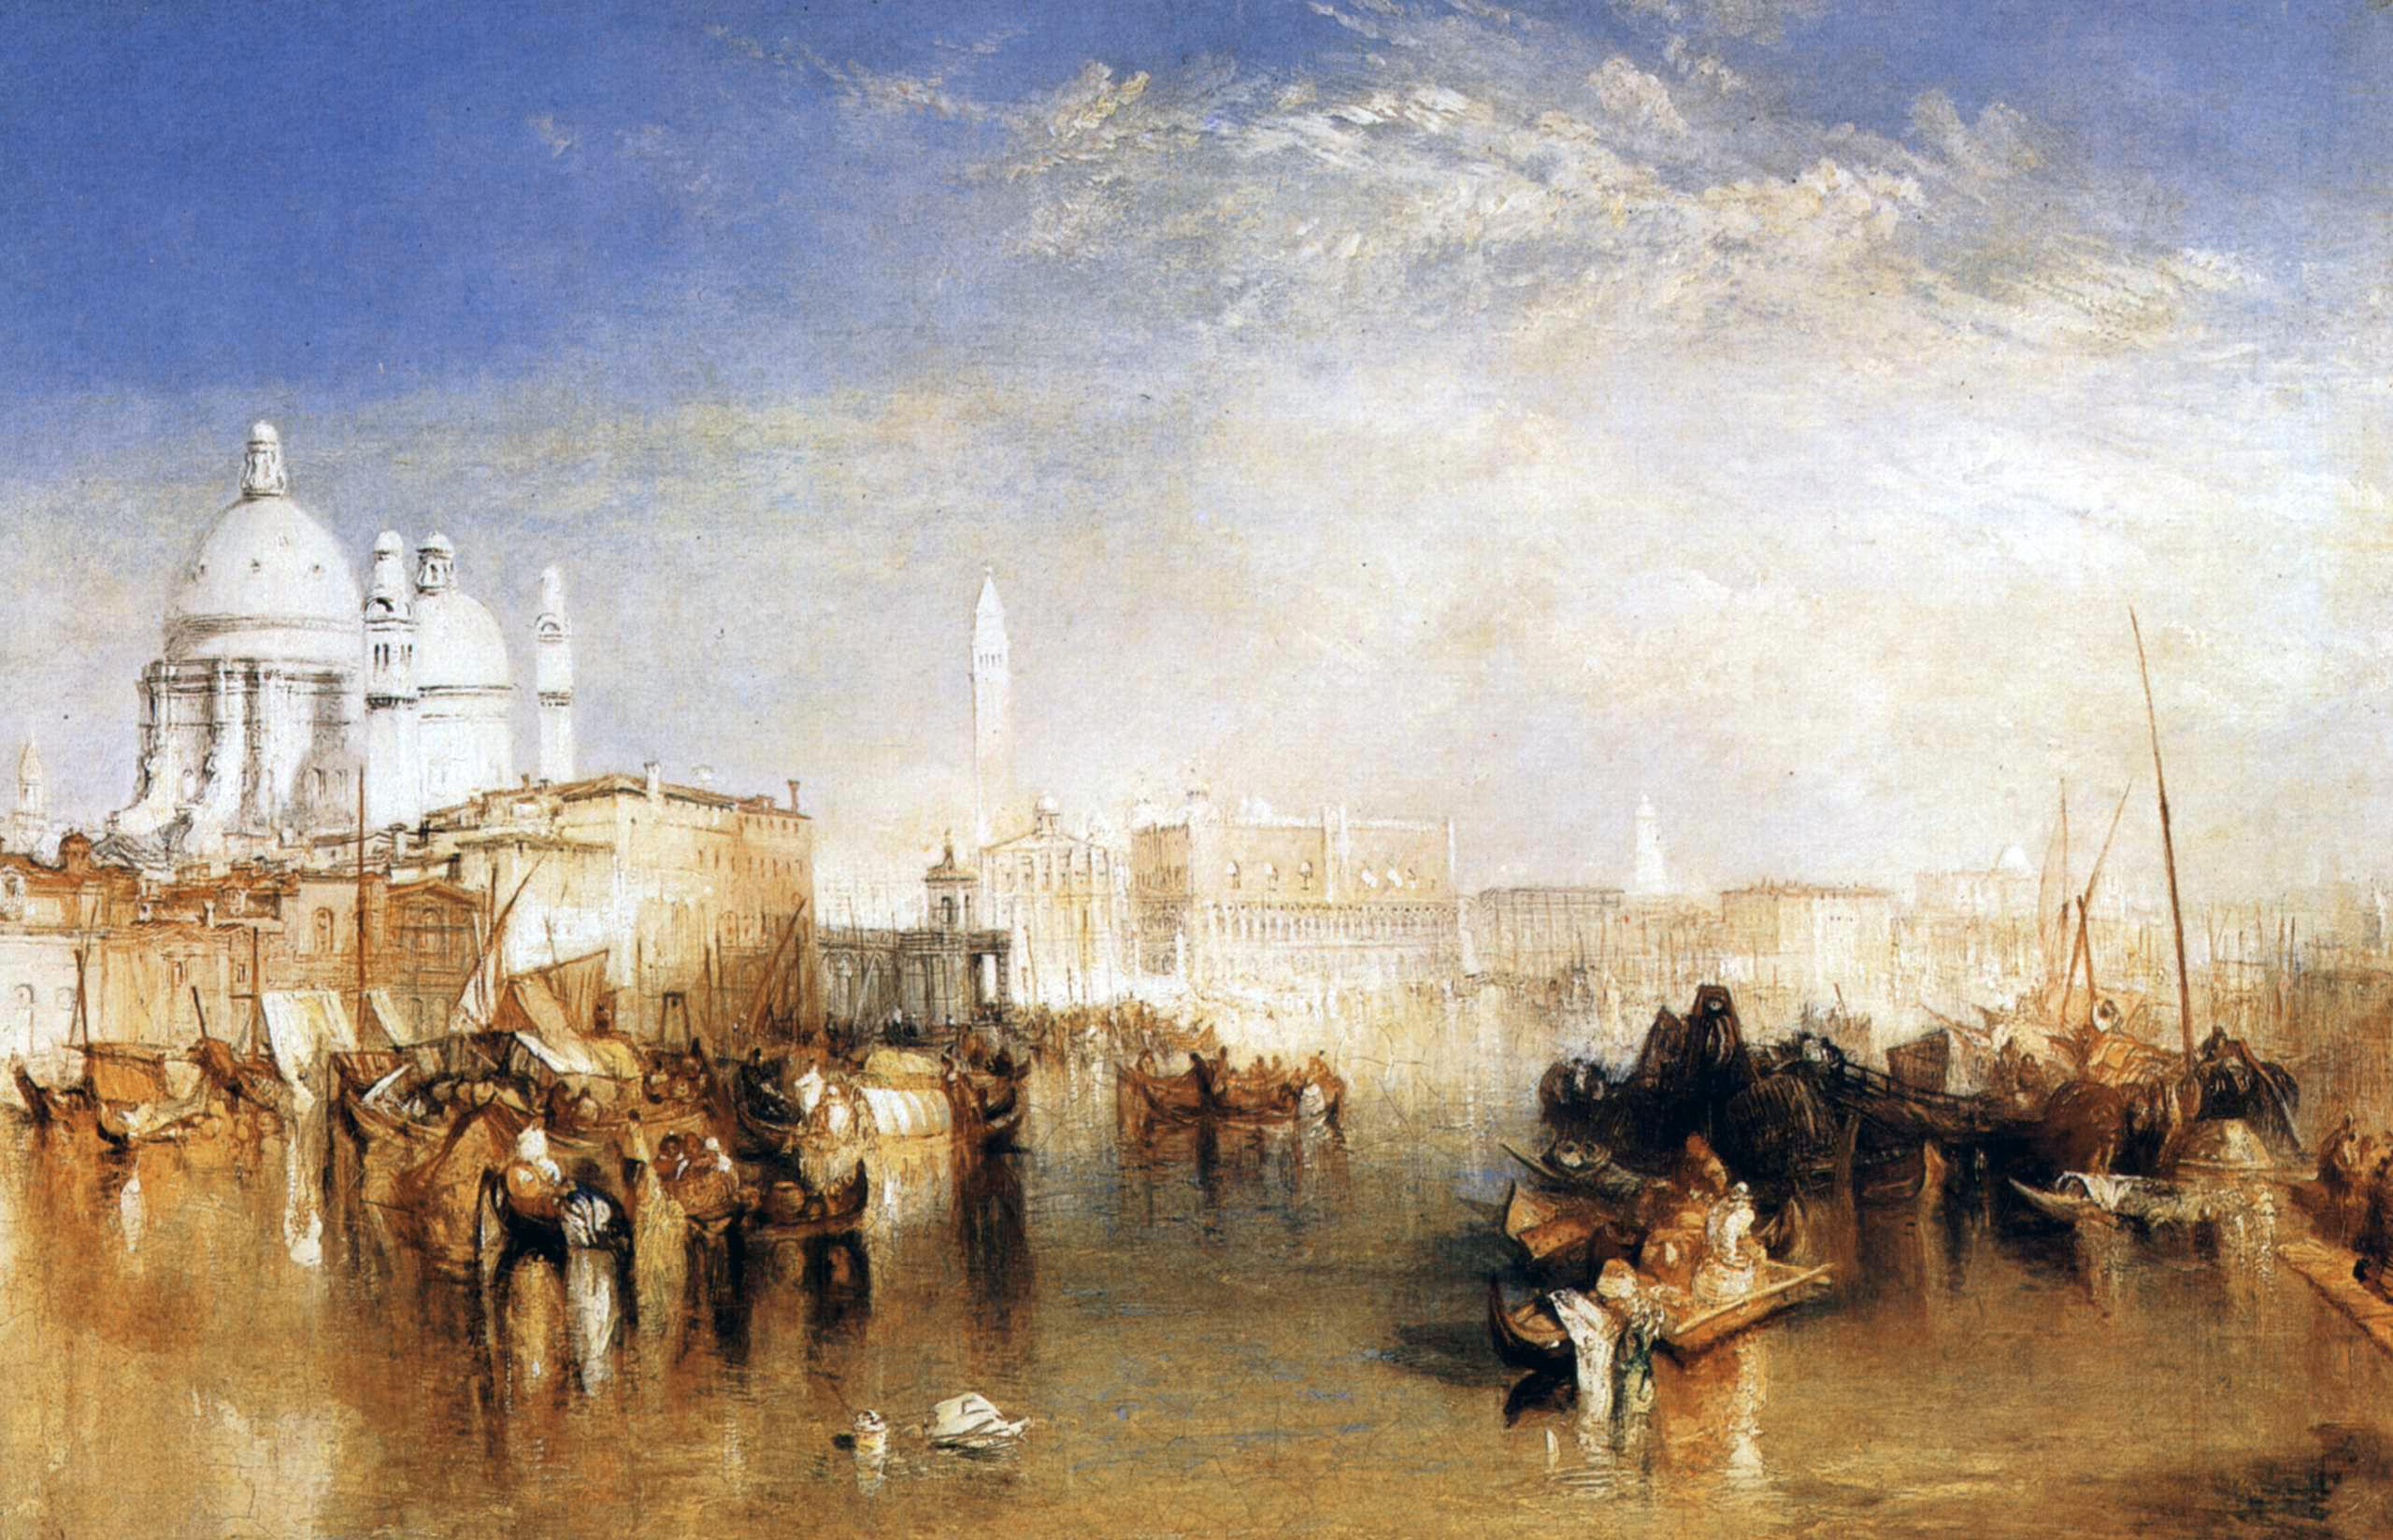 HDoboi.Kiev.ua - Венеция, вид с канала Джудекка (1840 - Вильям Тернер)